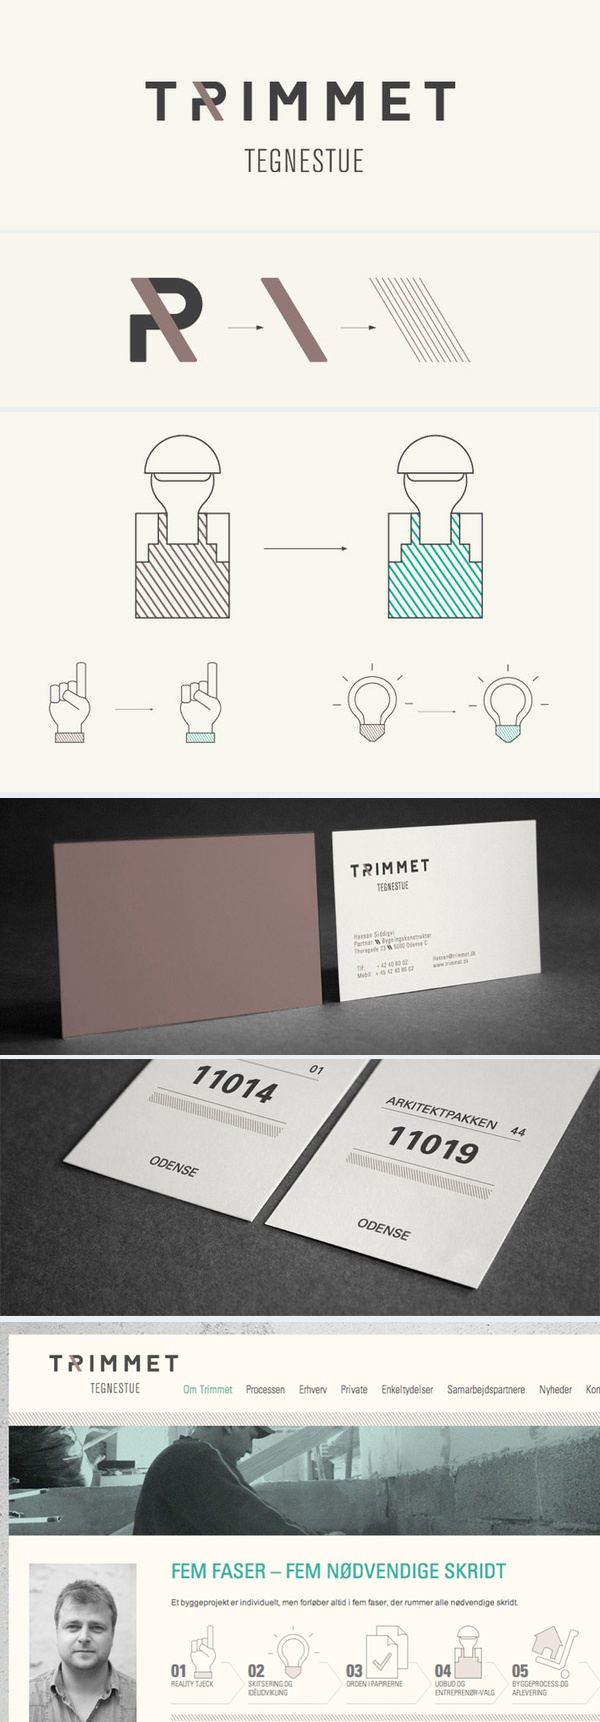 visual identity + logo + branding